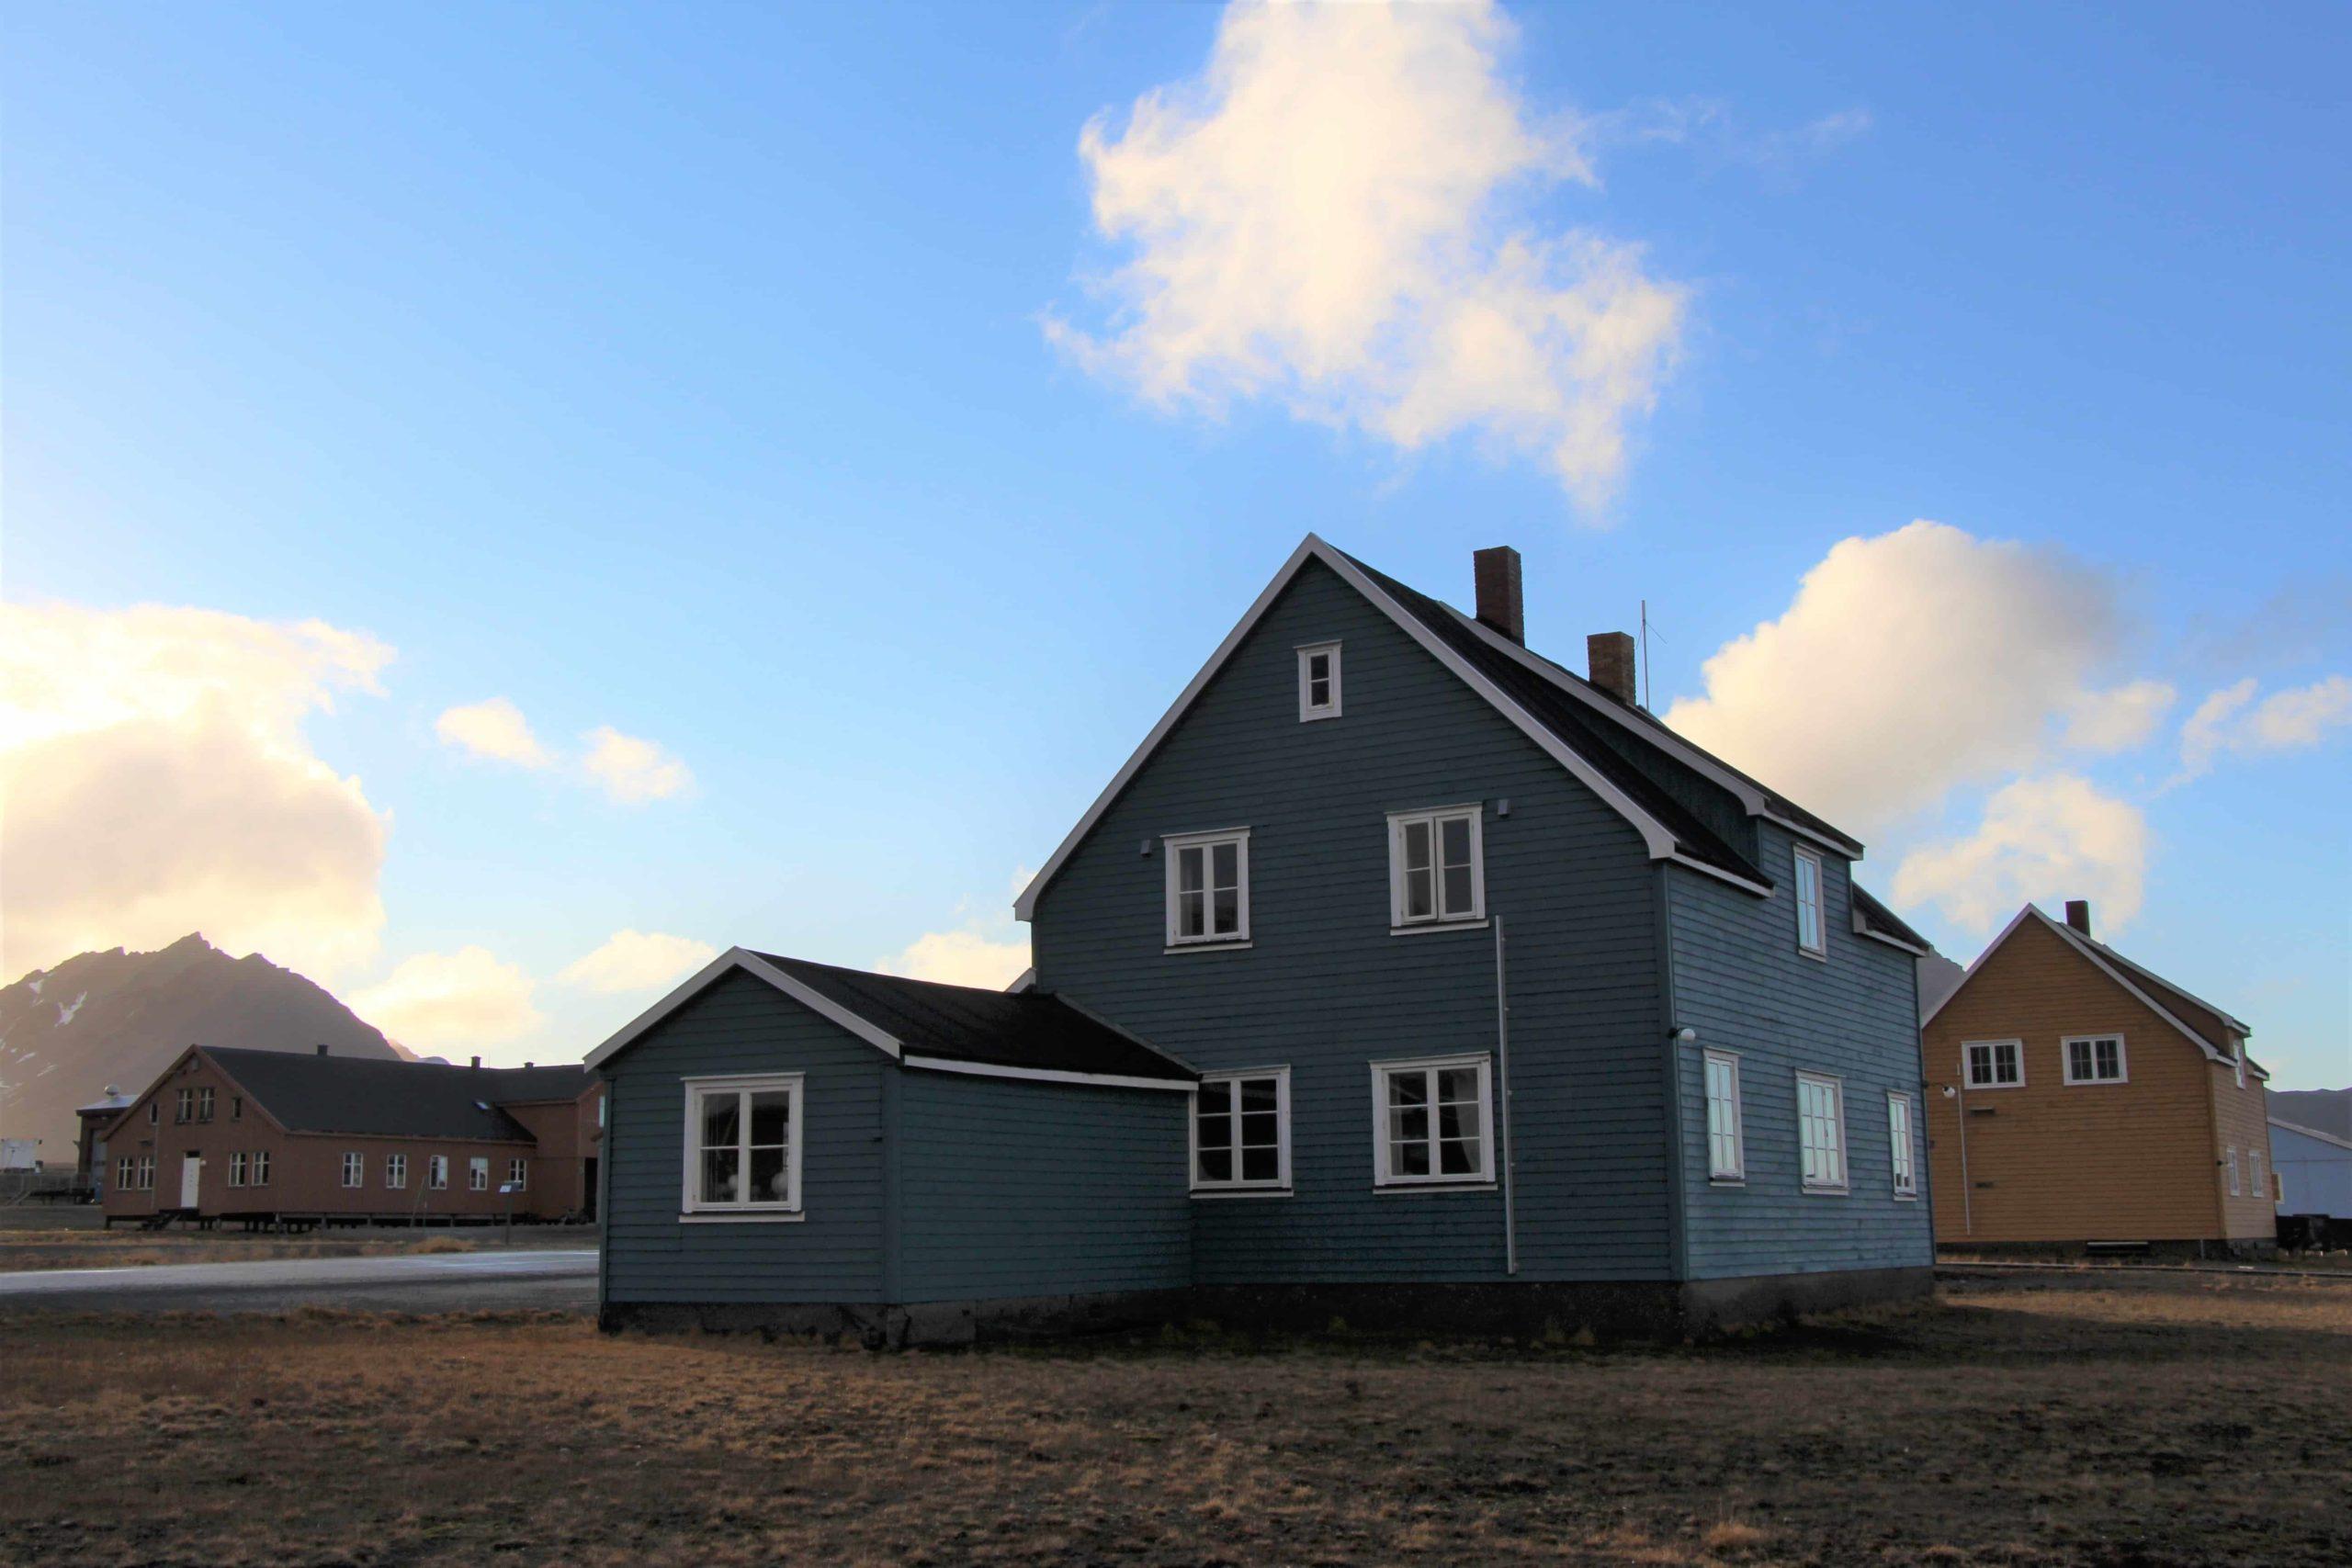 AWI Gebäude Ny Alesund, Michael Lonardi